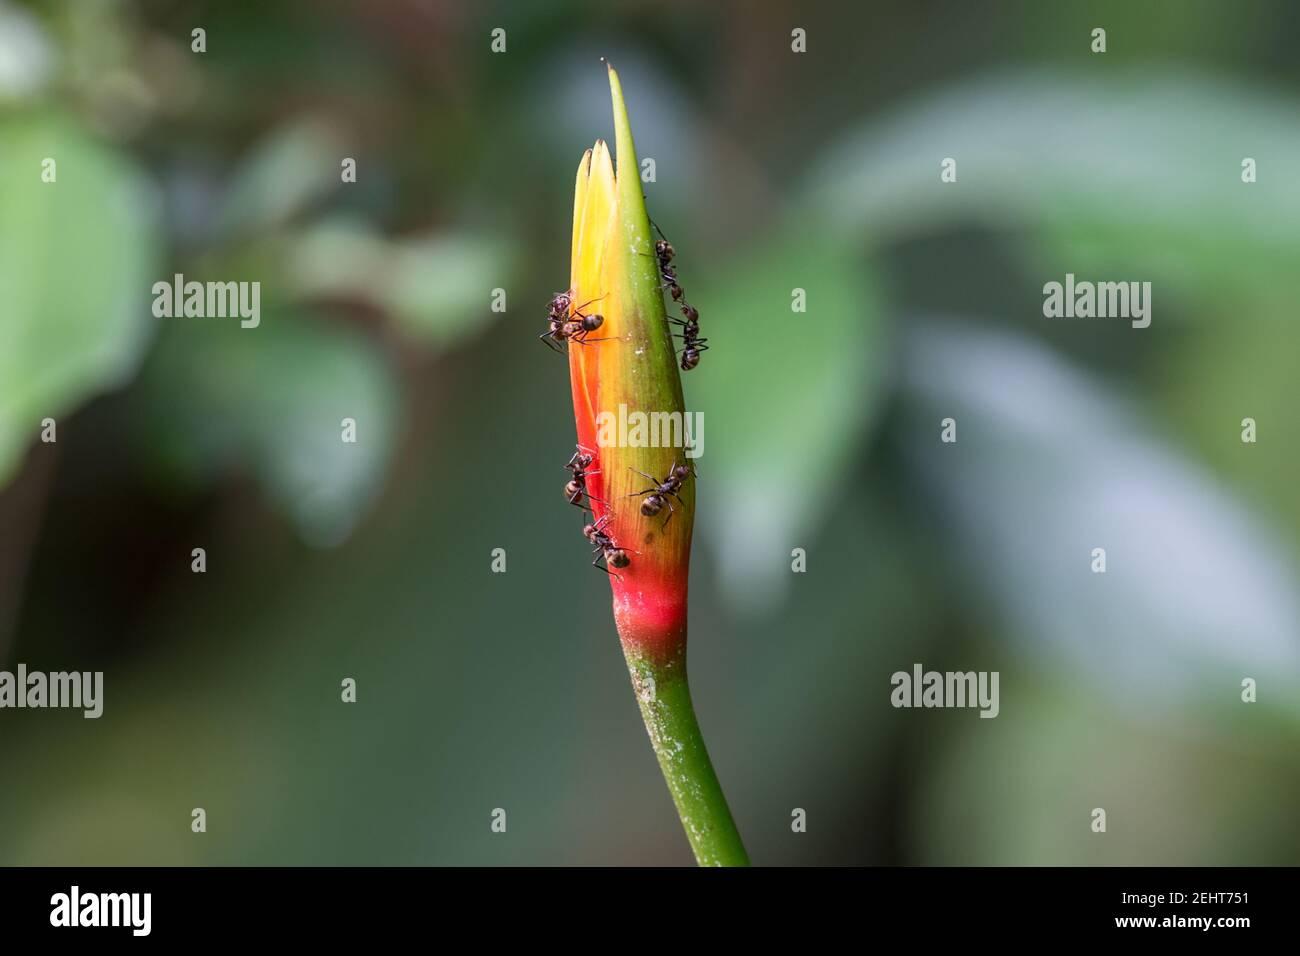 Flower with Bullet ant, Paraponera clavata, Amazon rainforest, Yasuni National Park, Napo River, Ecuador Stock Photo